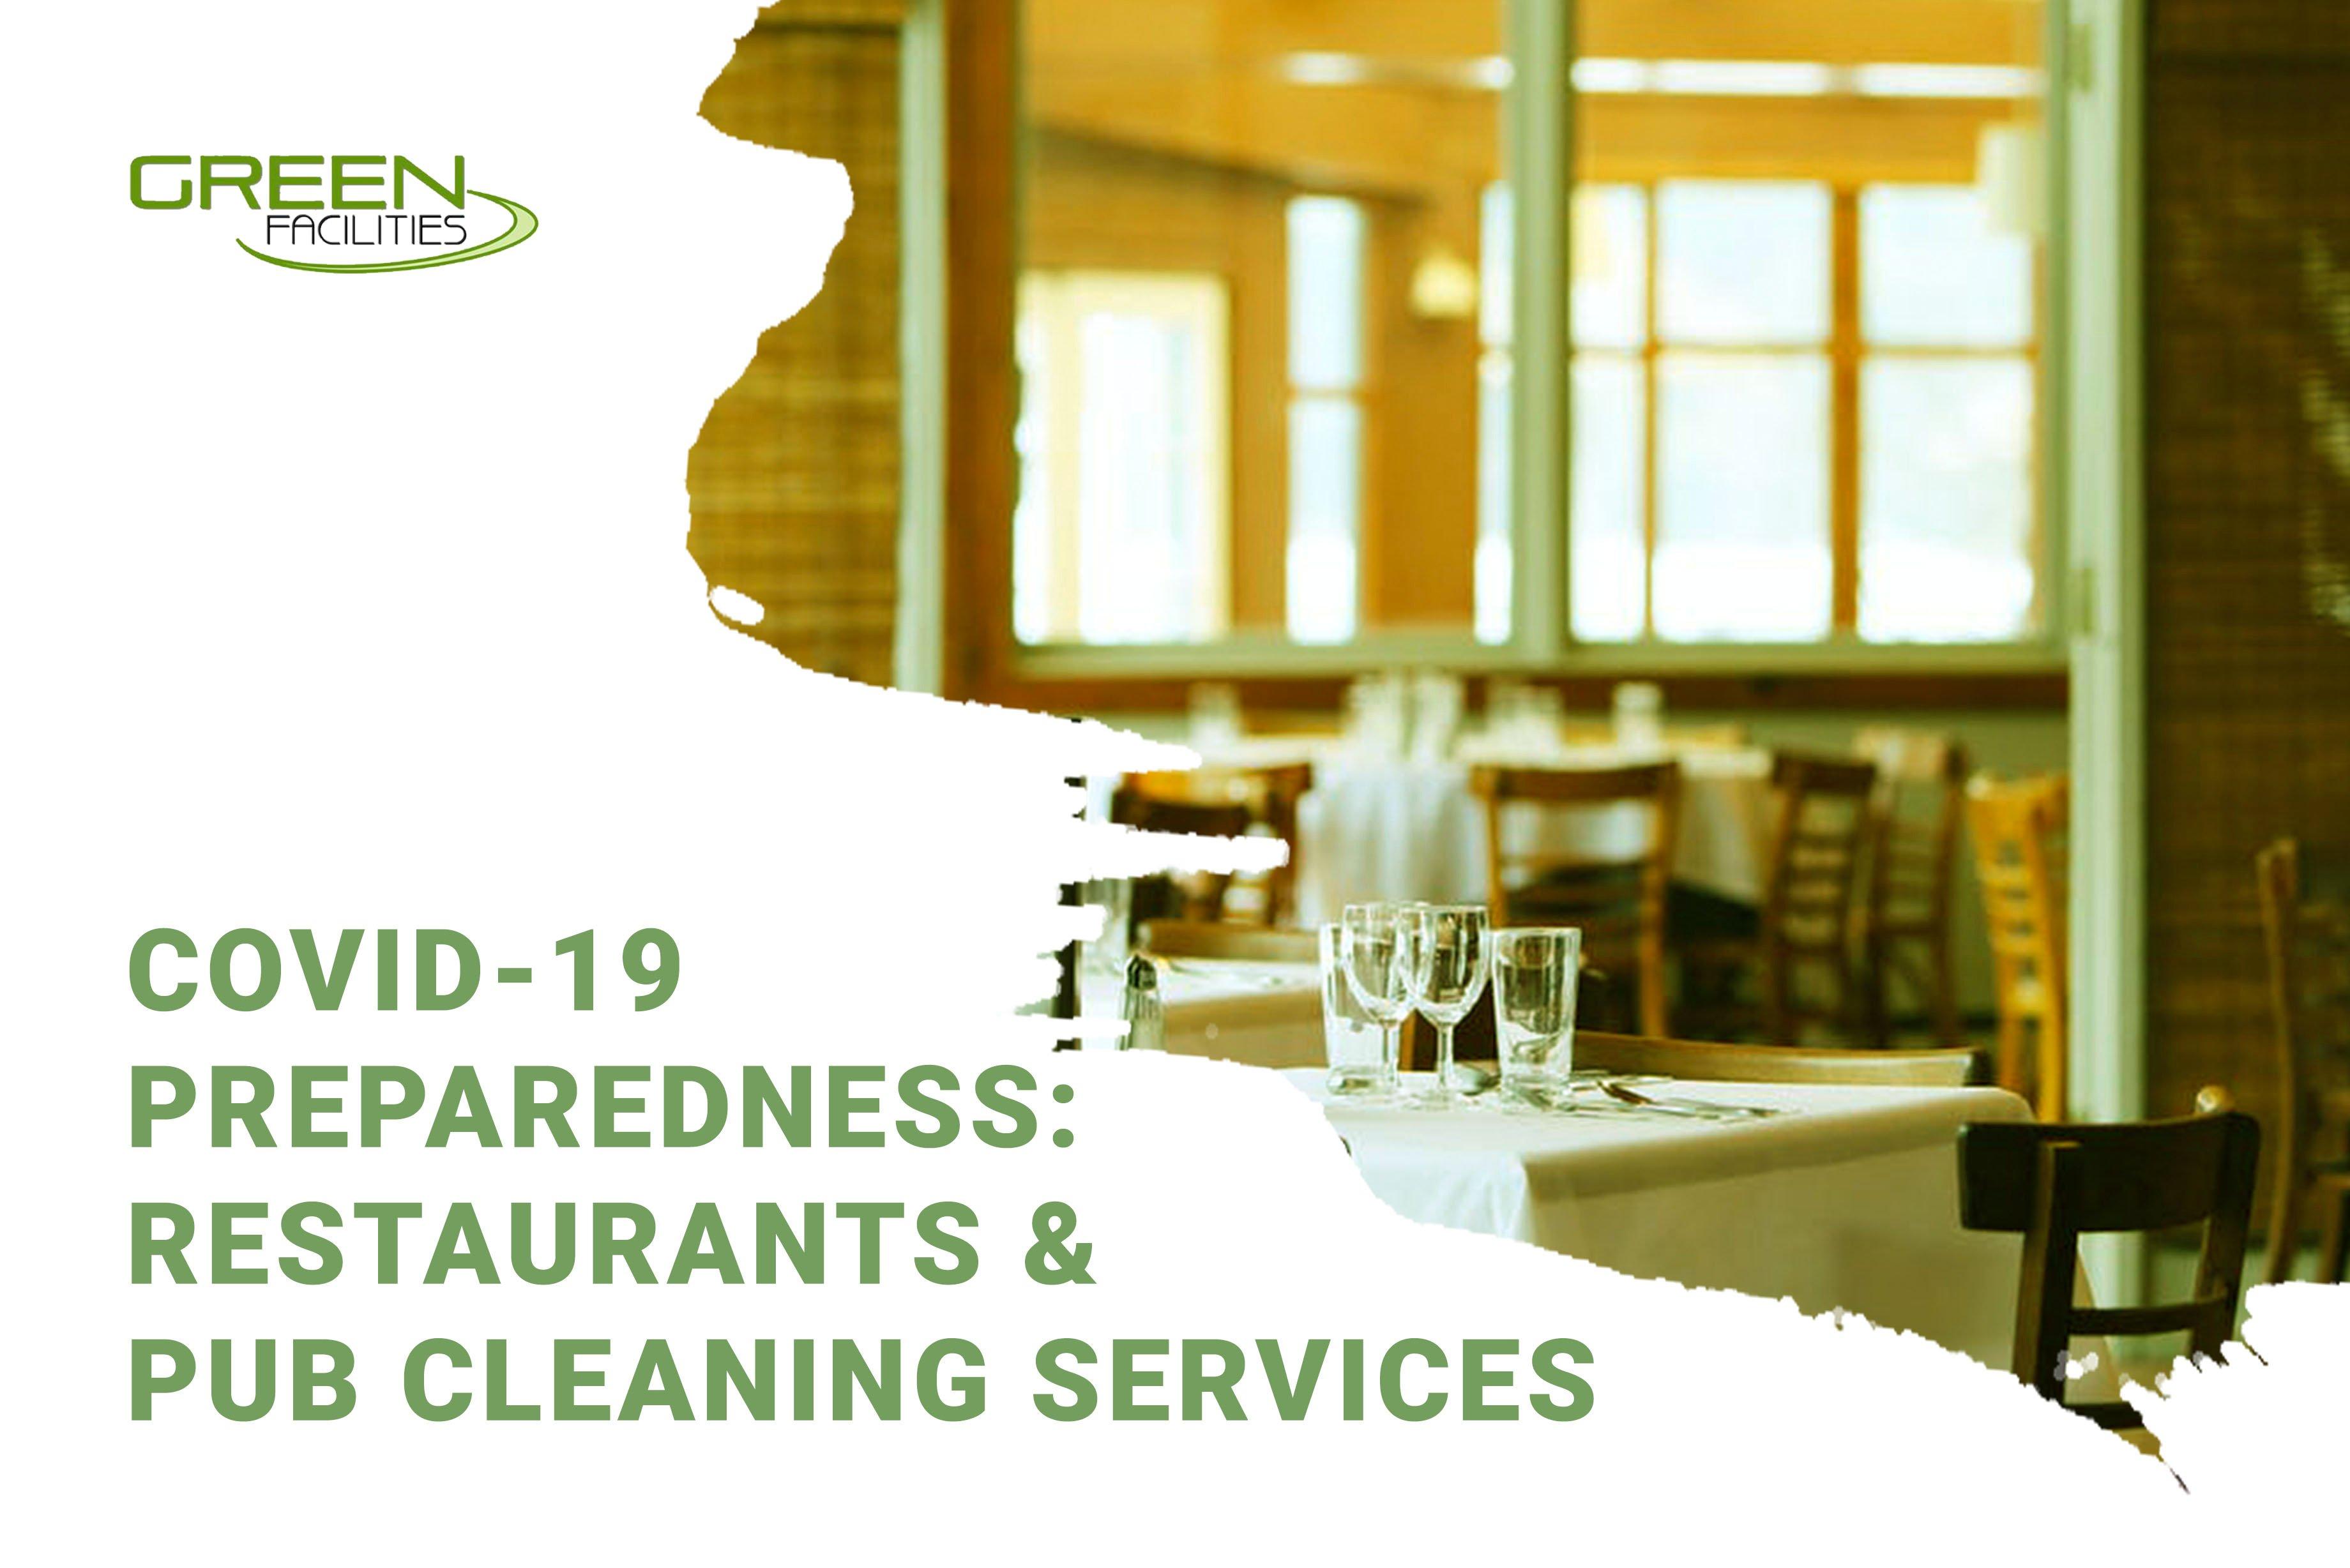 COVID-19-Preparedness-Restaurants-Pub-Cleaning-Services